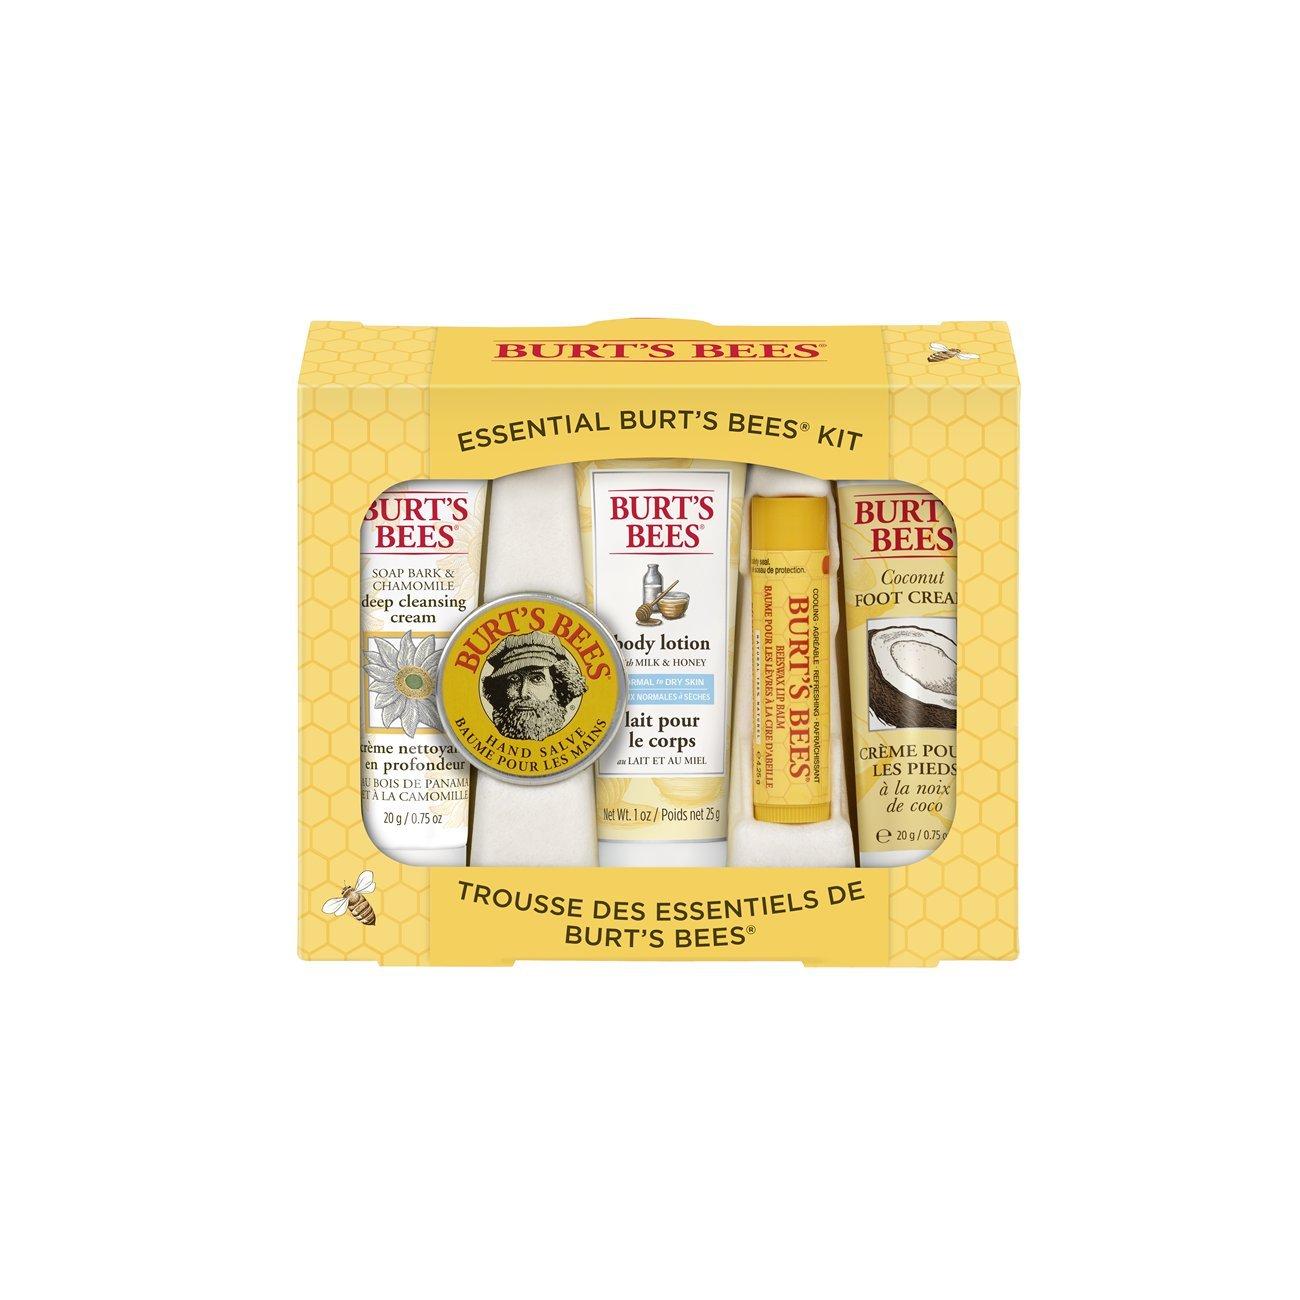 Burt's Bees Essential Body Kit Burt's Bees 00916-24